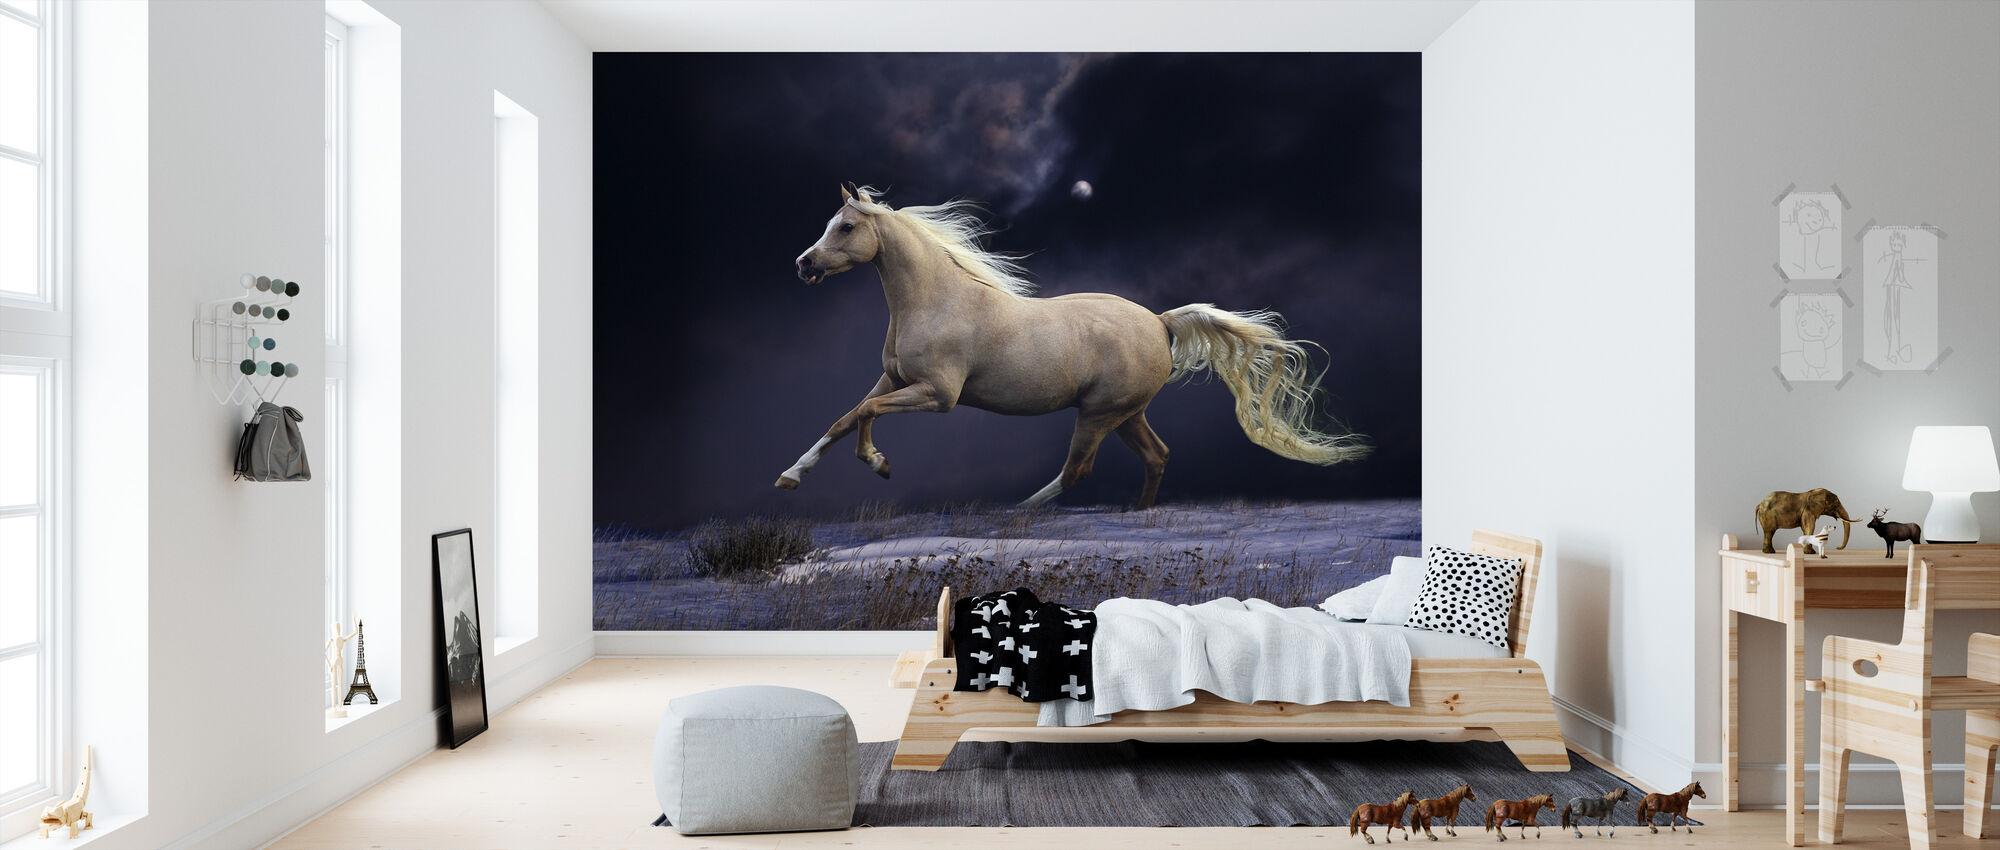 Horse in Moonlight - Wallpaper - Kids Room